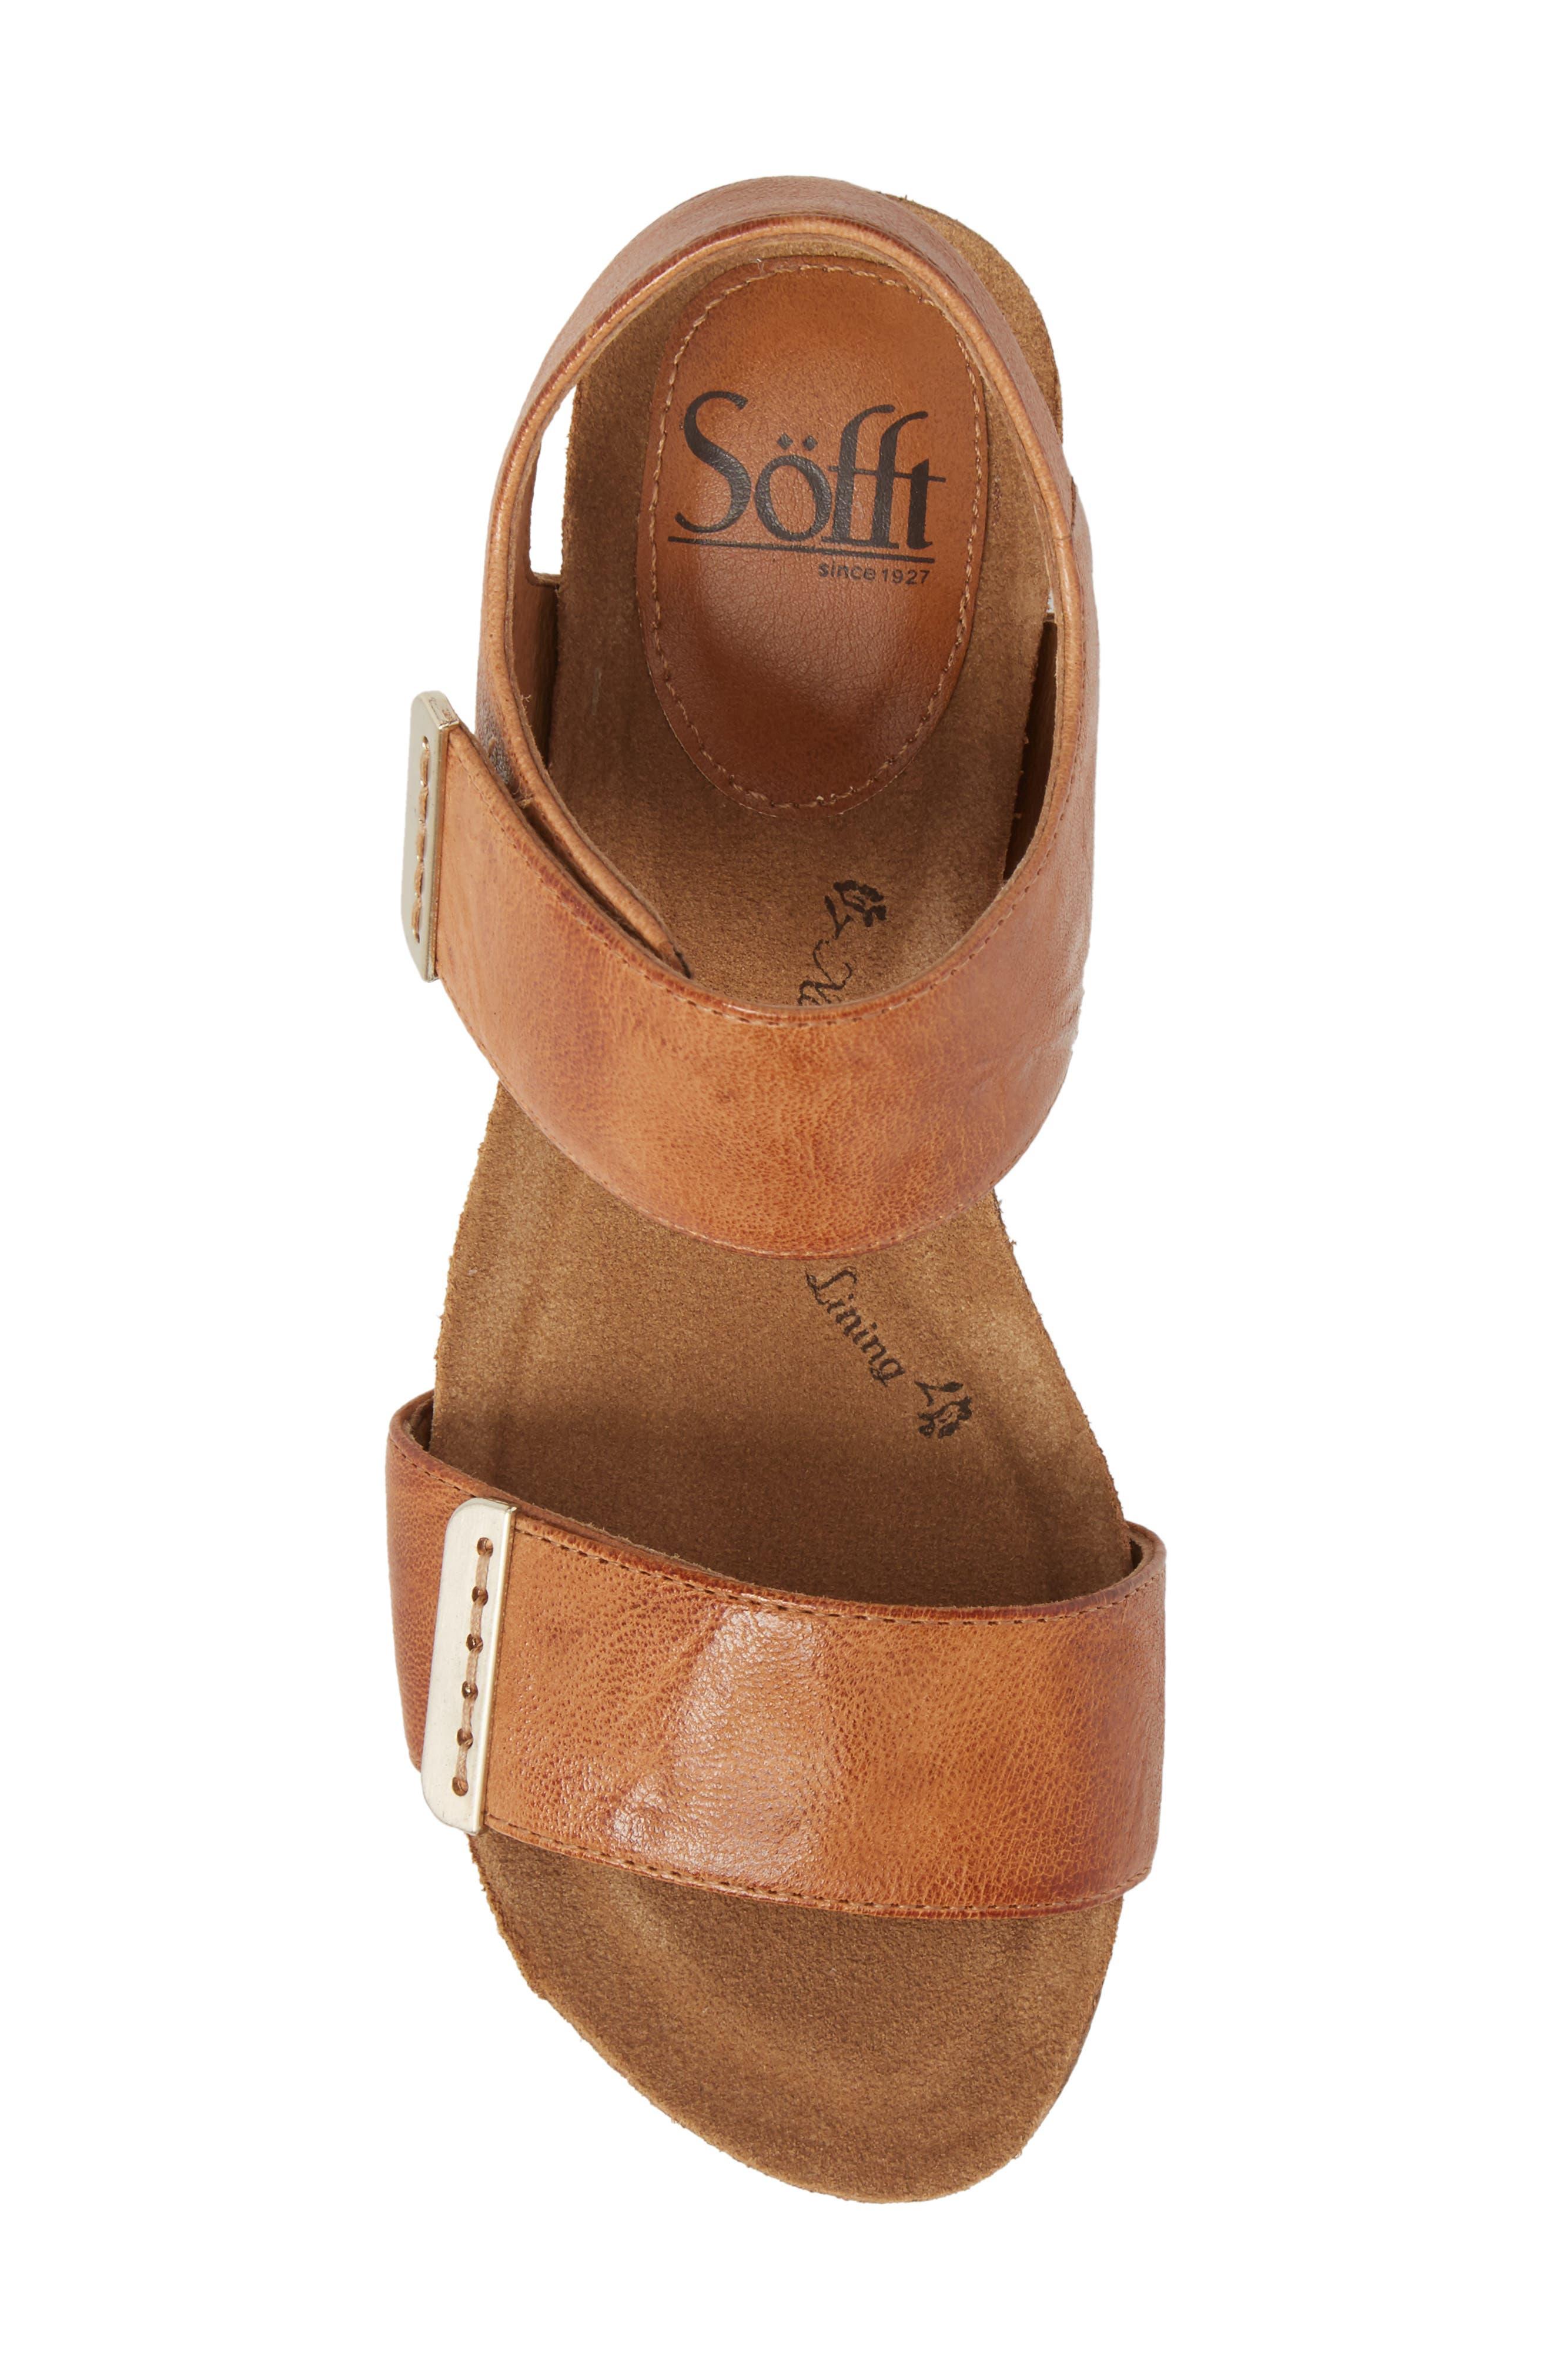 Verdi Wedge Sandal,                             Alternate thumbnail 5, color,                             Luggage Leather